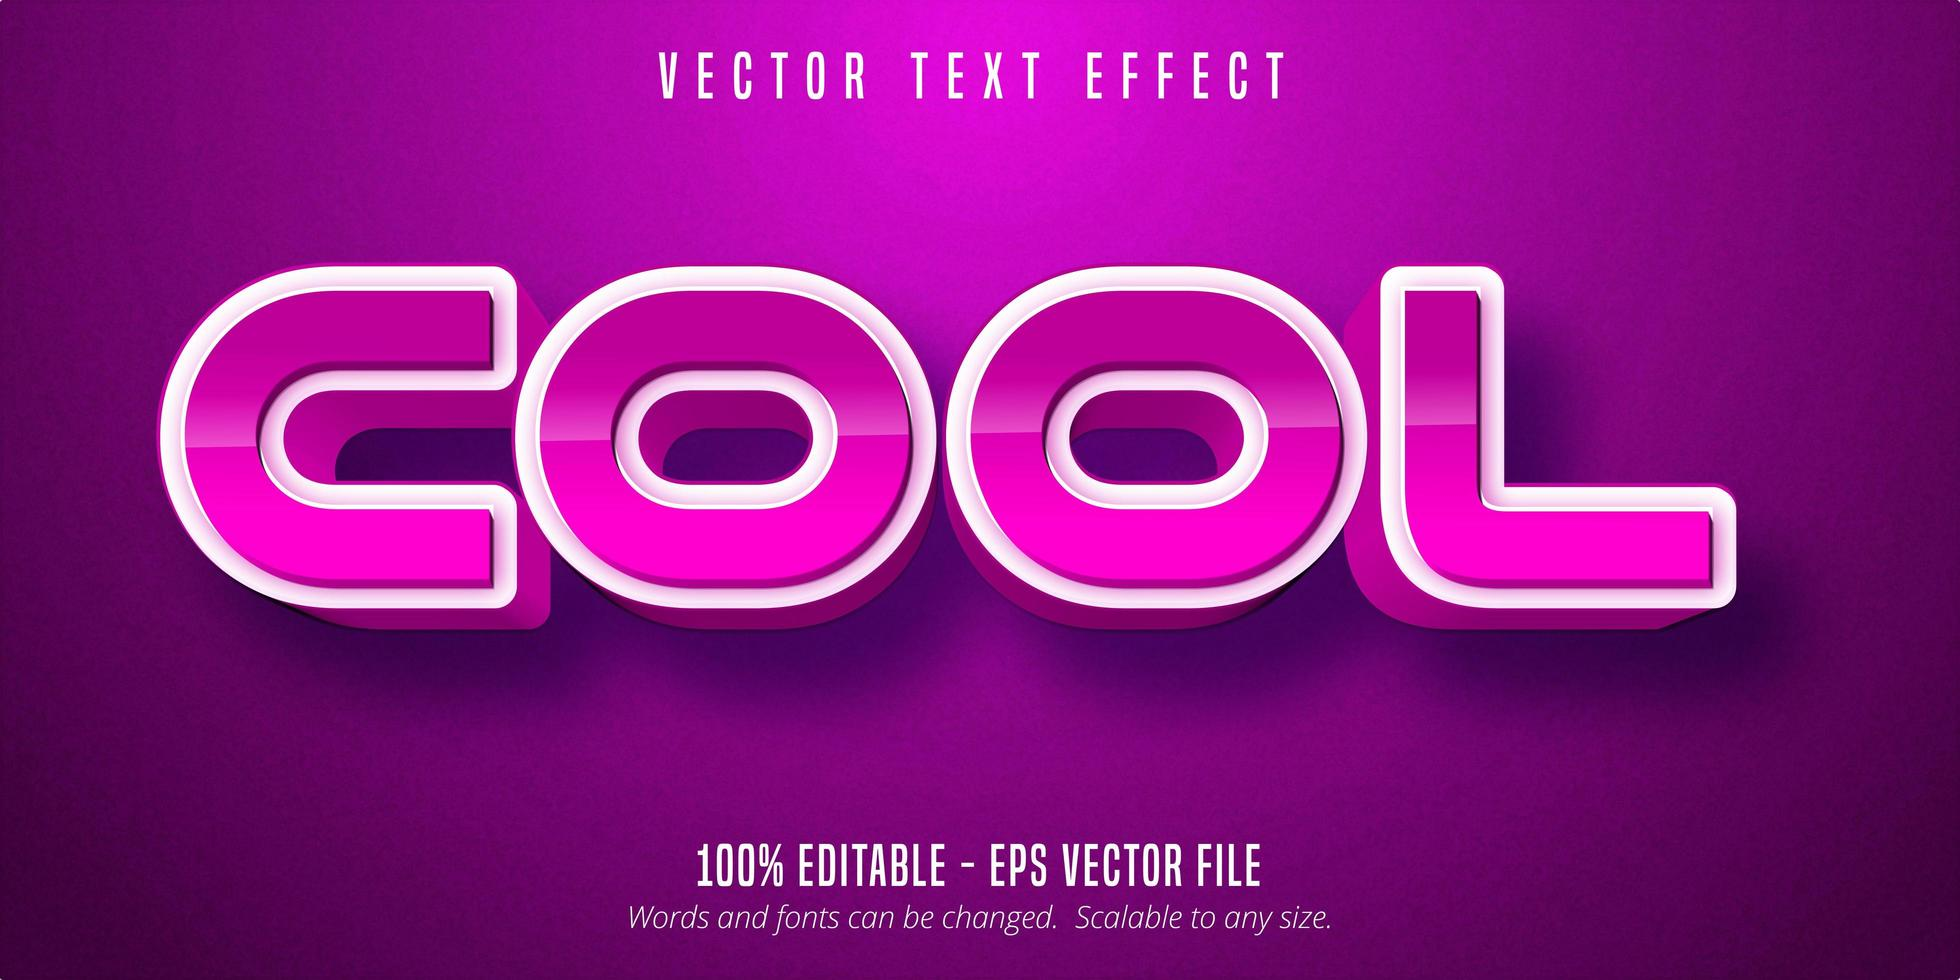 cool stil redigerbar texteffekt vektor